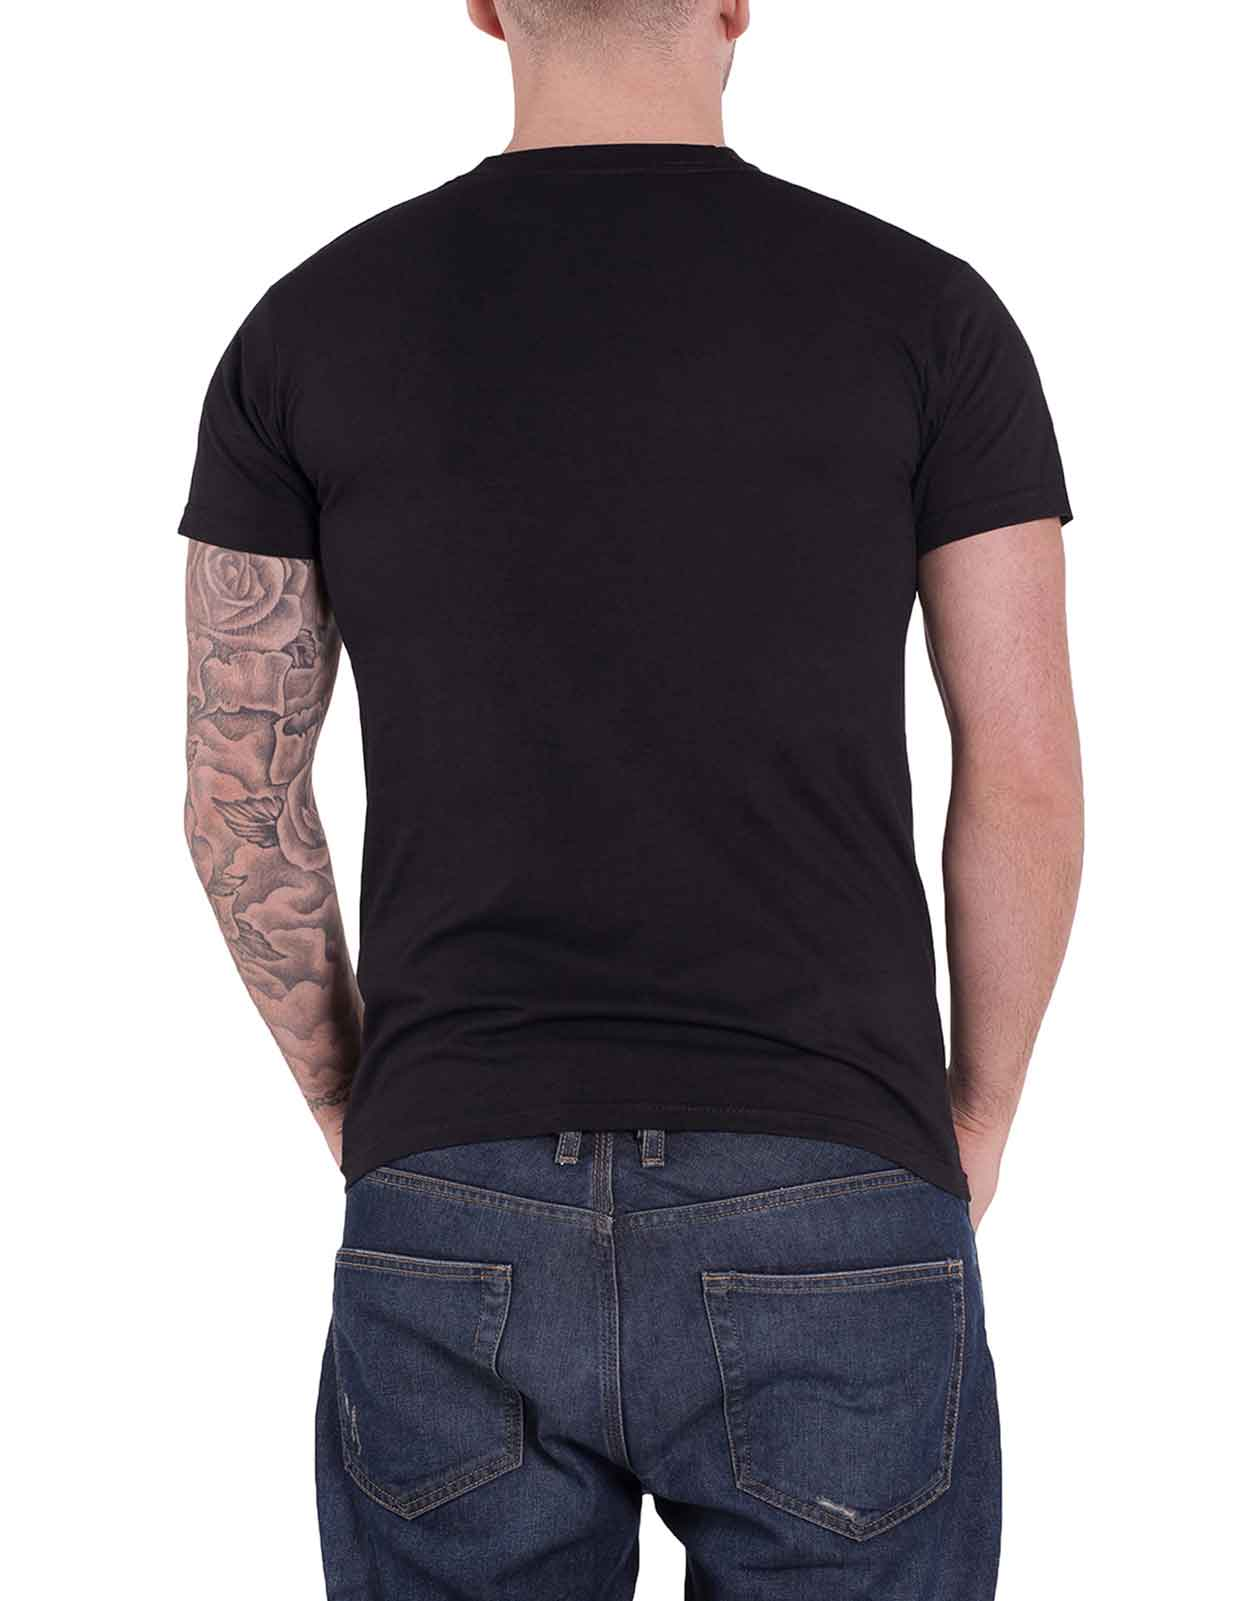 Official-Motley-Crue-T-Shirt-Shout-at-the-Devil-The-Dirt-Tour-Band-Logo-Mens thumbnail 37